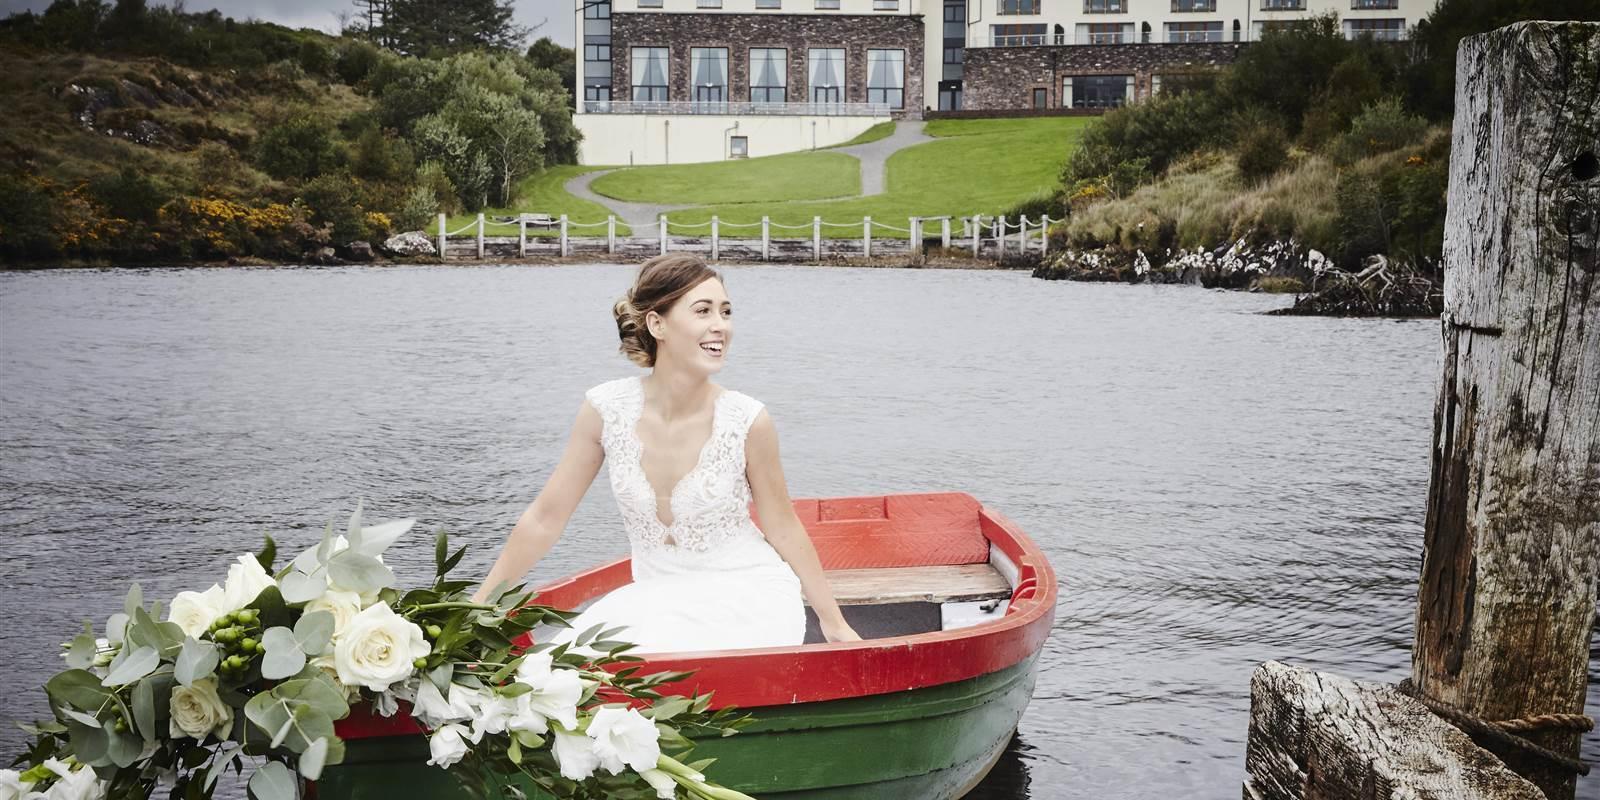 Sneem Bride Boat